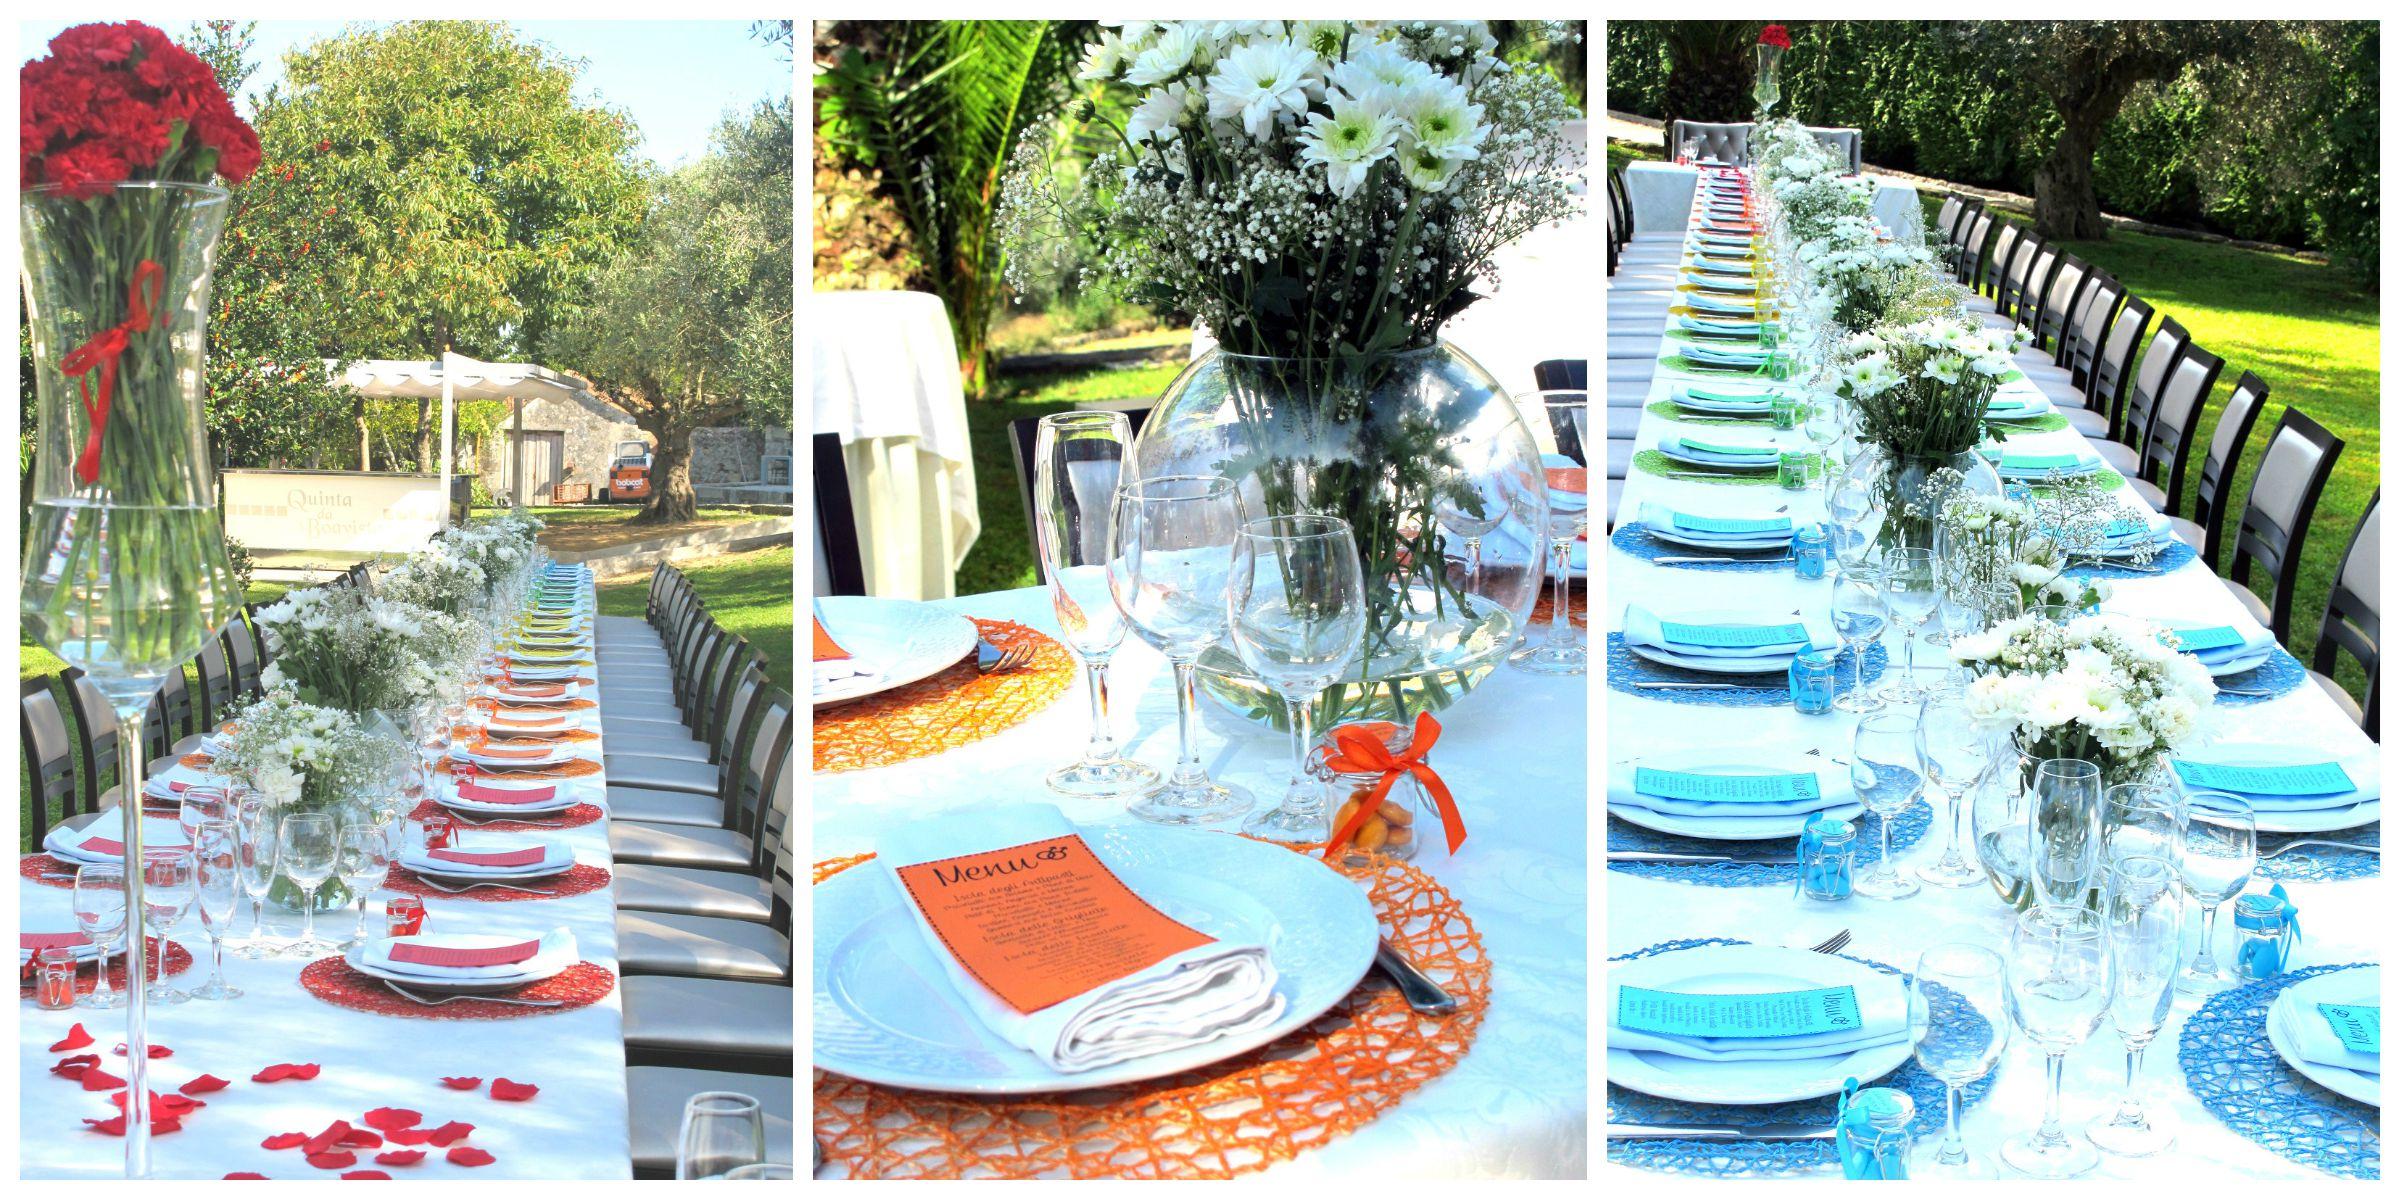 Matrimonio Tema Arcobaleno : Rainbow wedding mise en place weddinglam matrimoni